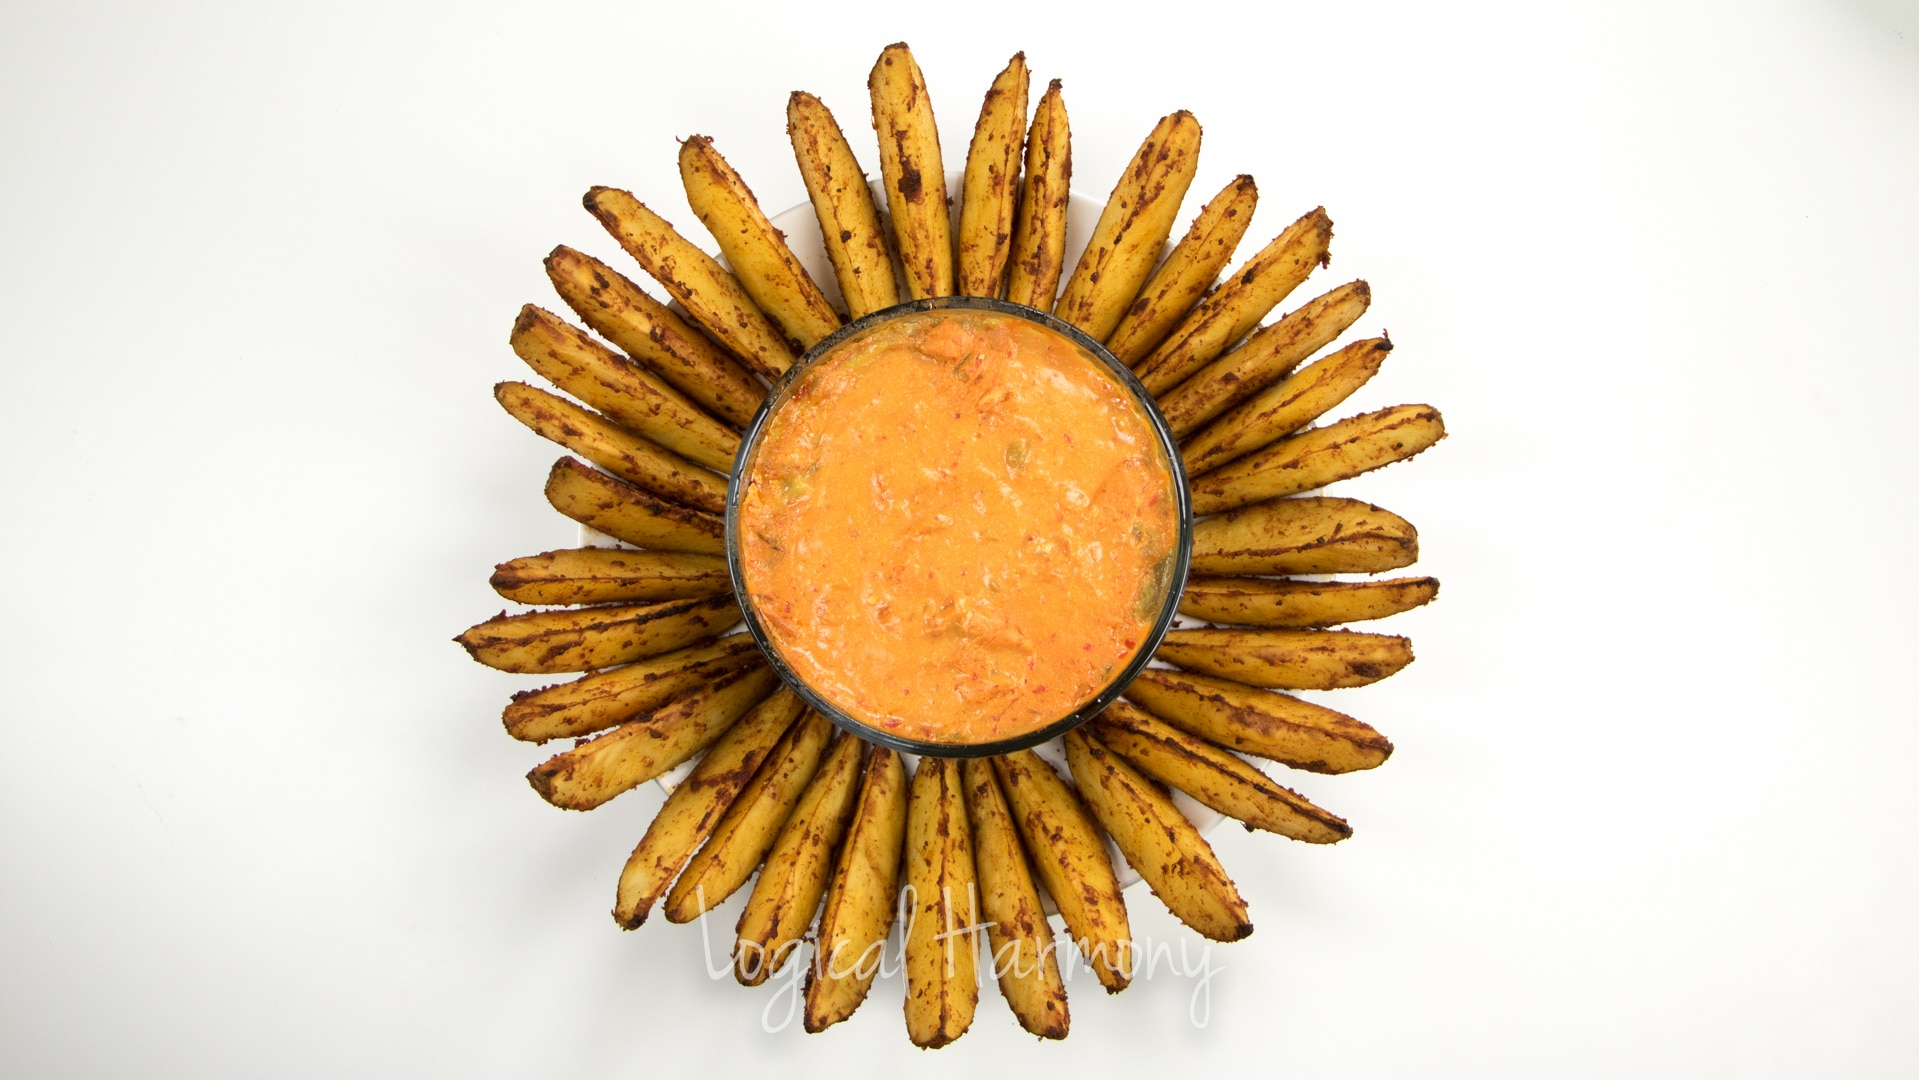 Layered Nacheez Vegan Nacho Dip with Seasoned Potato Wedges